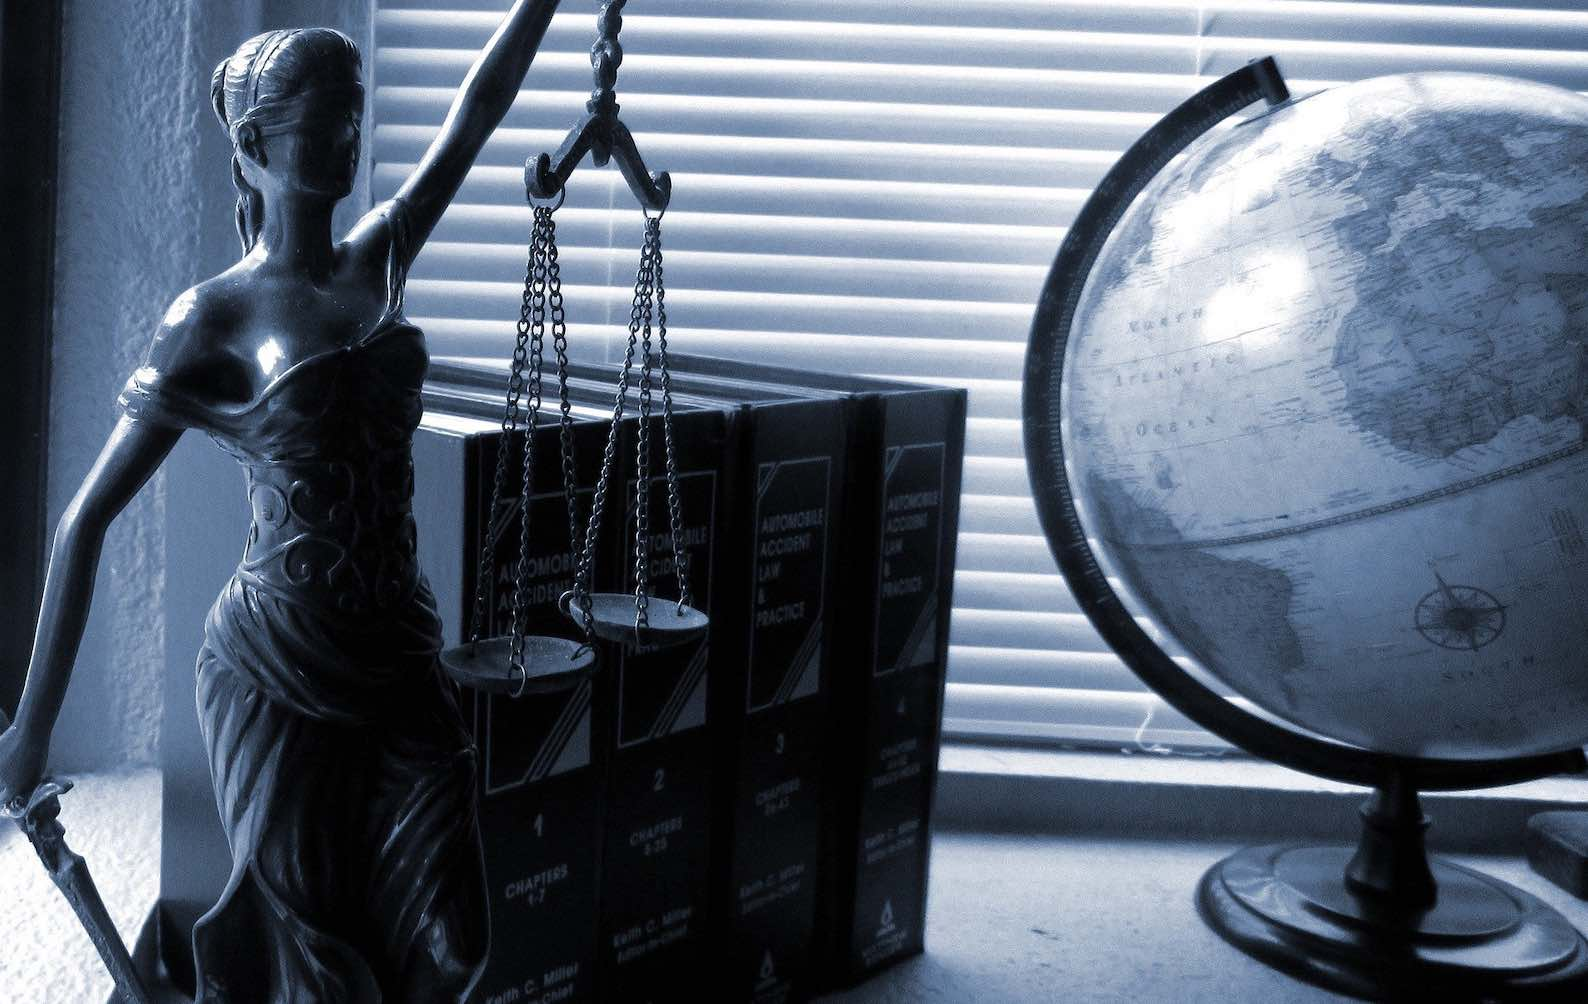 justicia bitclub